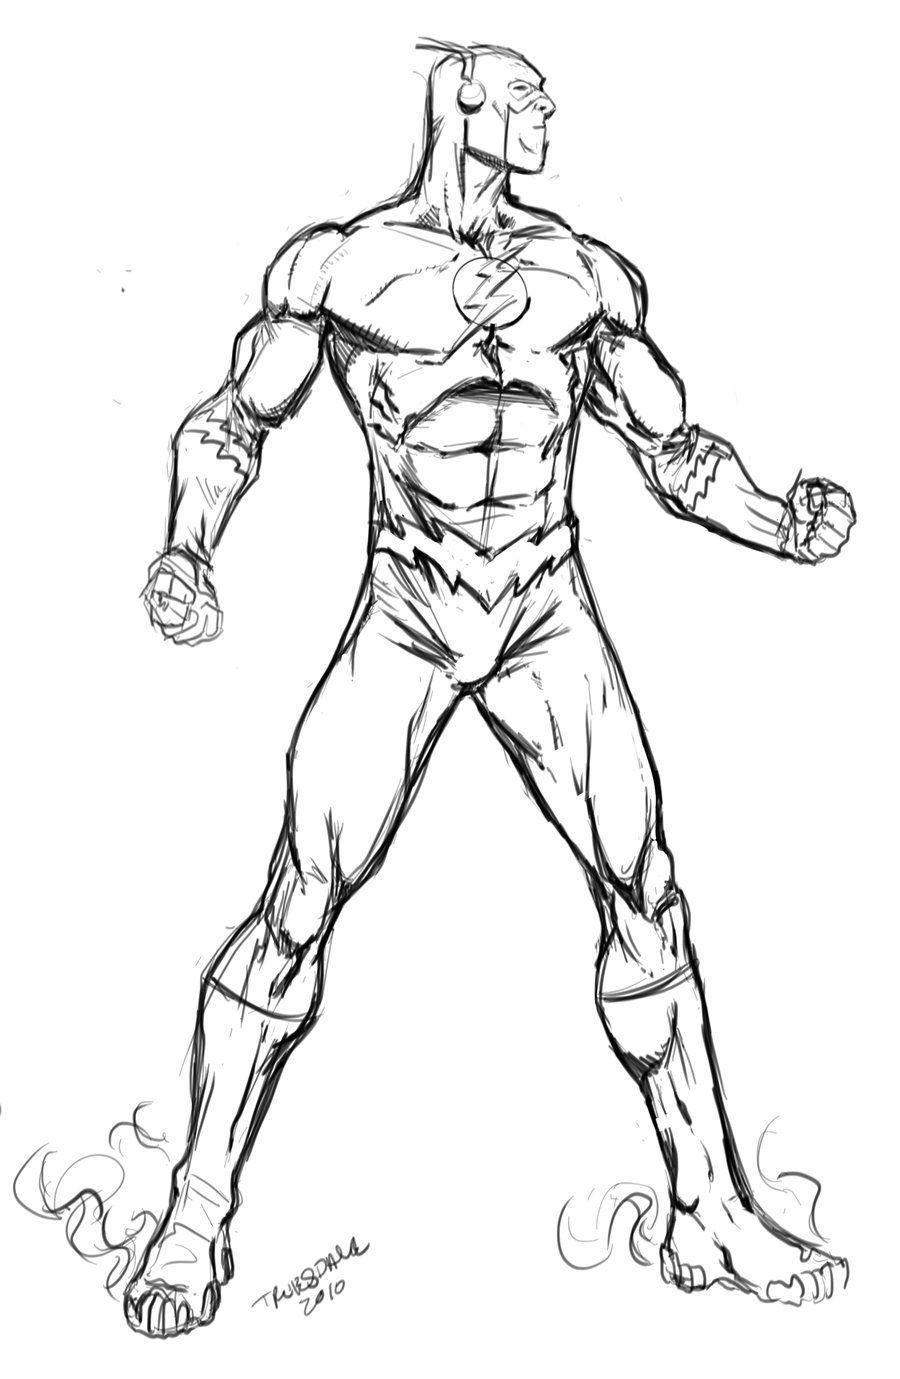 How To Draw People Cartoon And Realistic Superhero